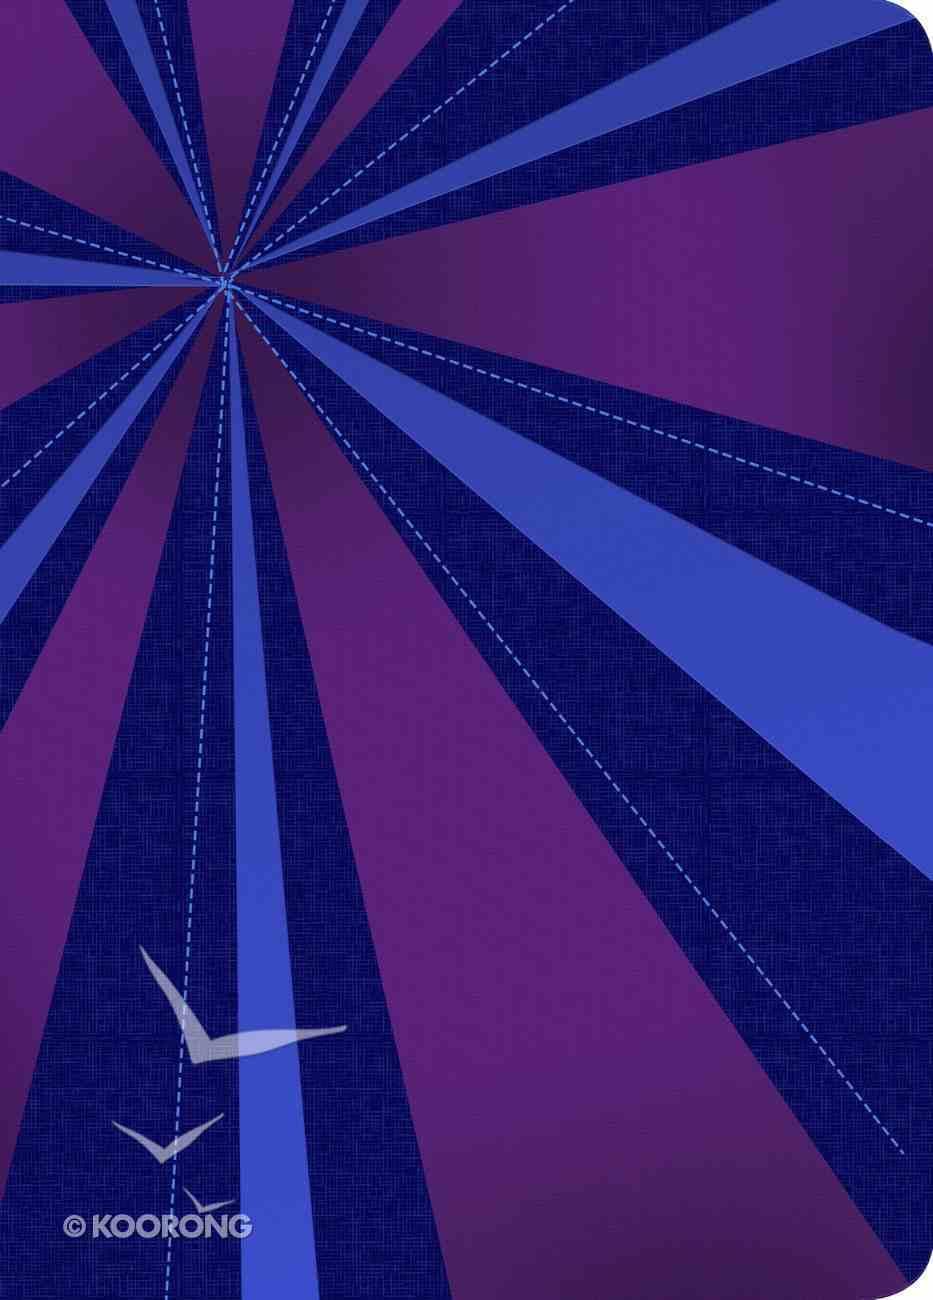 Rvr 1960 Biblia Compacta Letra Grande, Rayos De Azul/Violeta Smil Piel Con Ndice (Blue/purple Imitation Leather) Imitation Leather